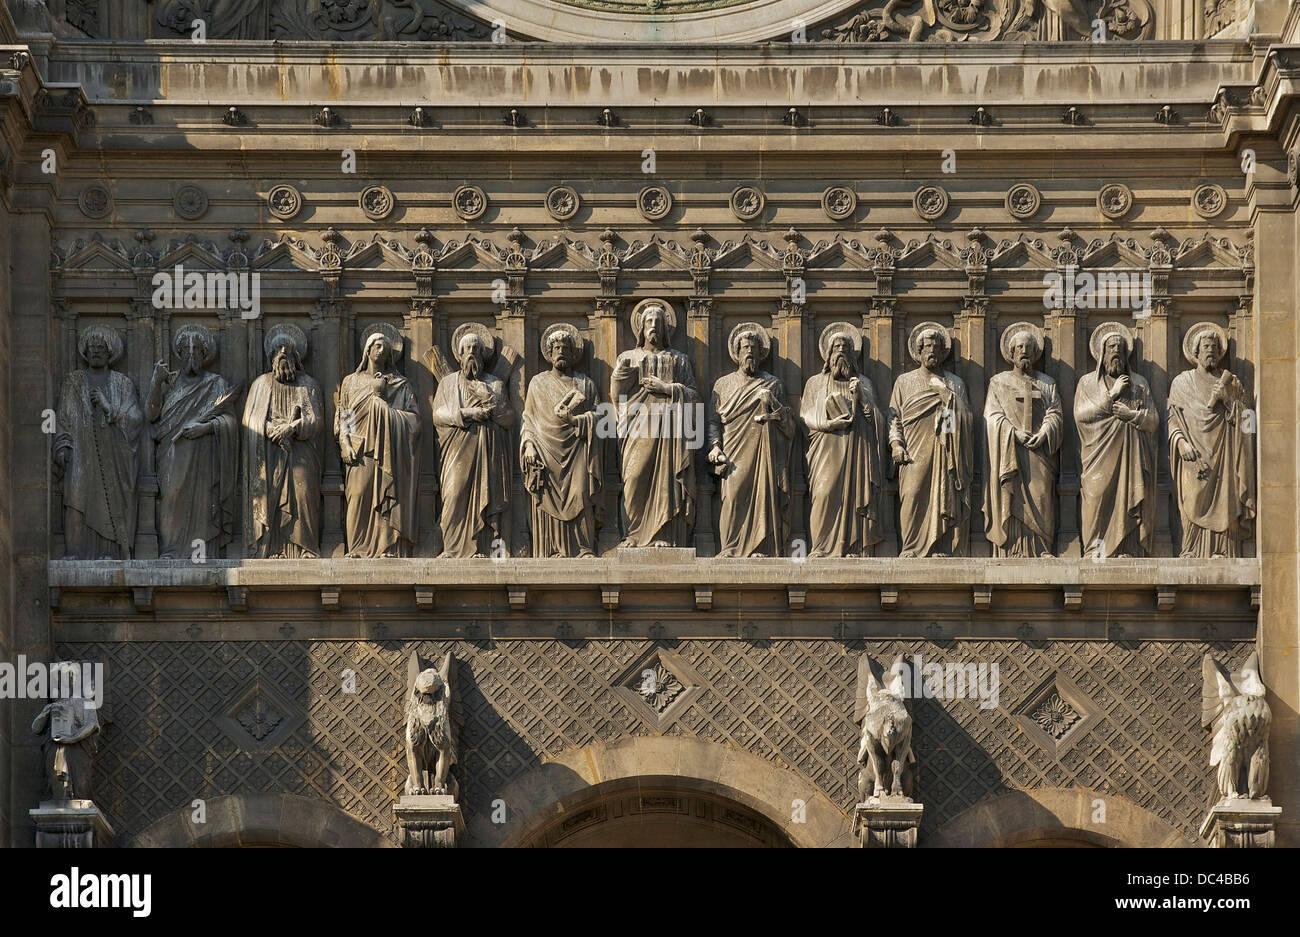 Frieze of Jesus and the Twelve Apostles, façade of church Saint-Augustin in Paris. - Stock Image